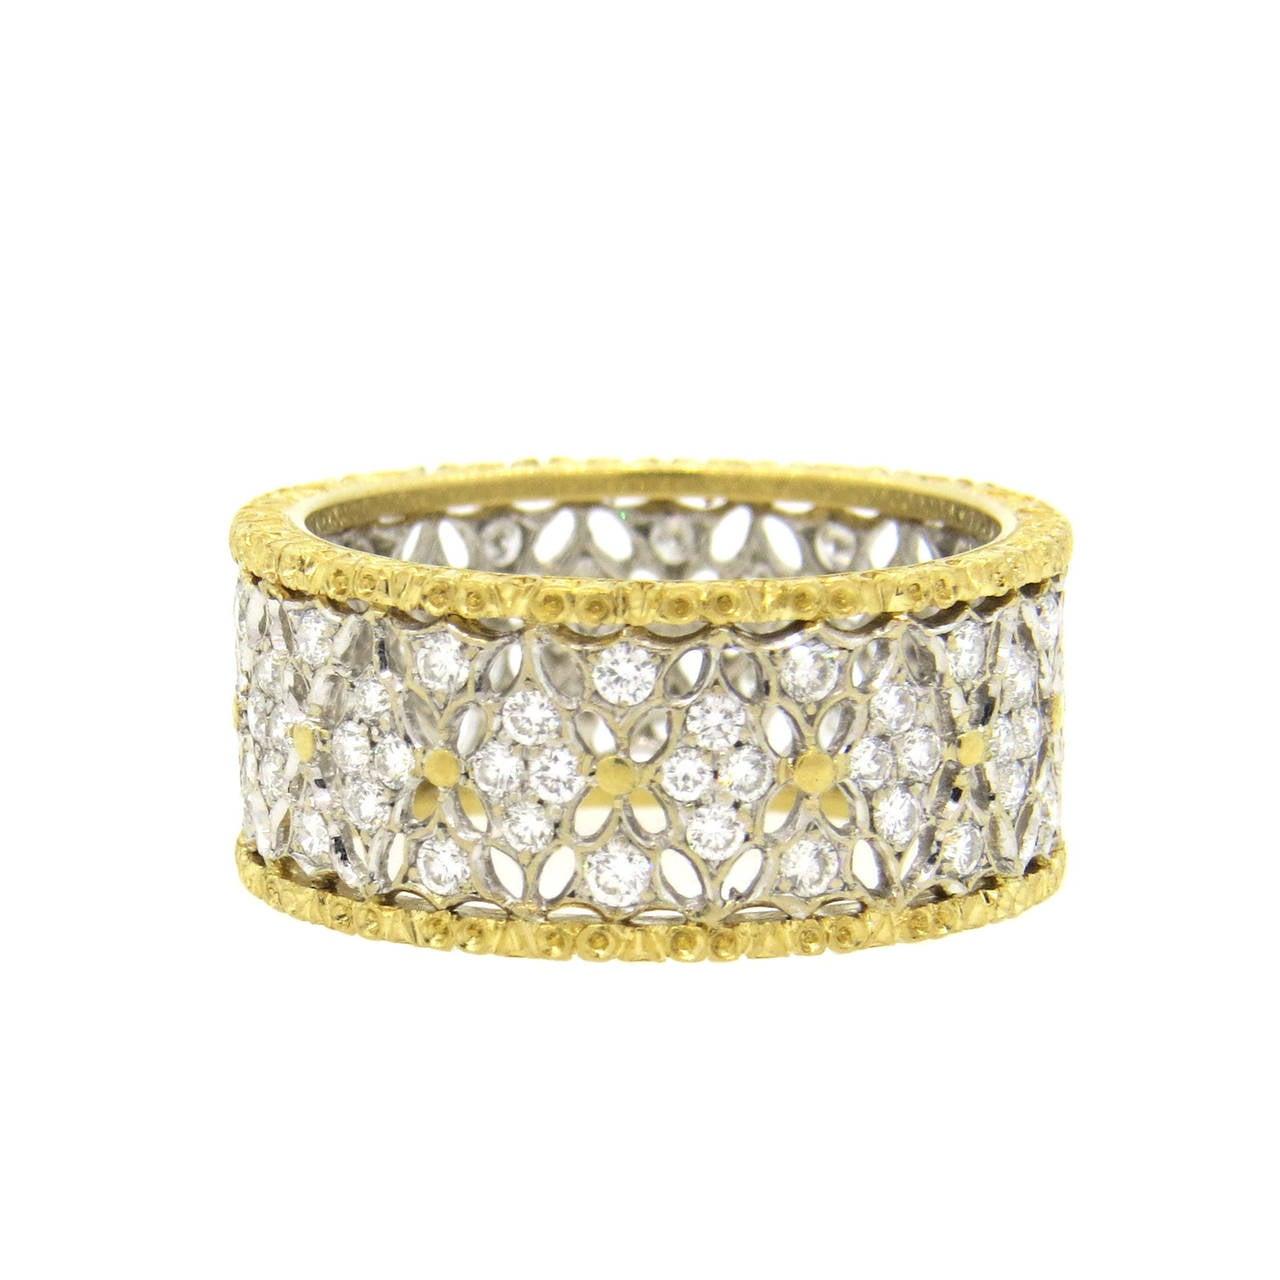 Buccellati Gold Diamond Band Ring 1